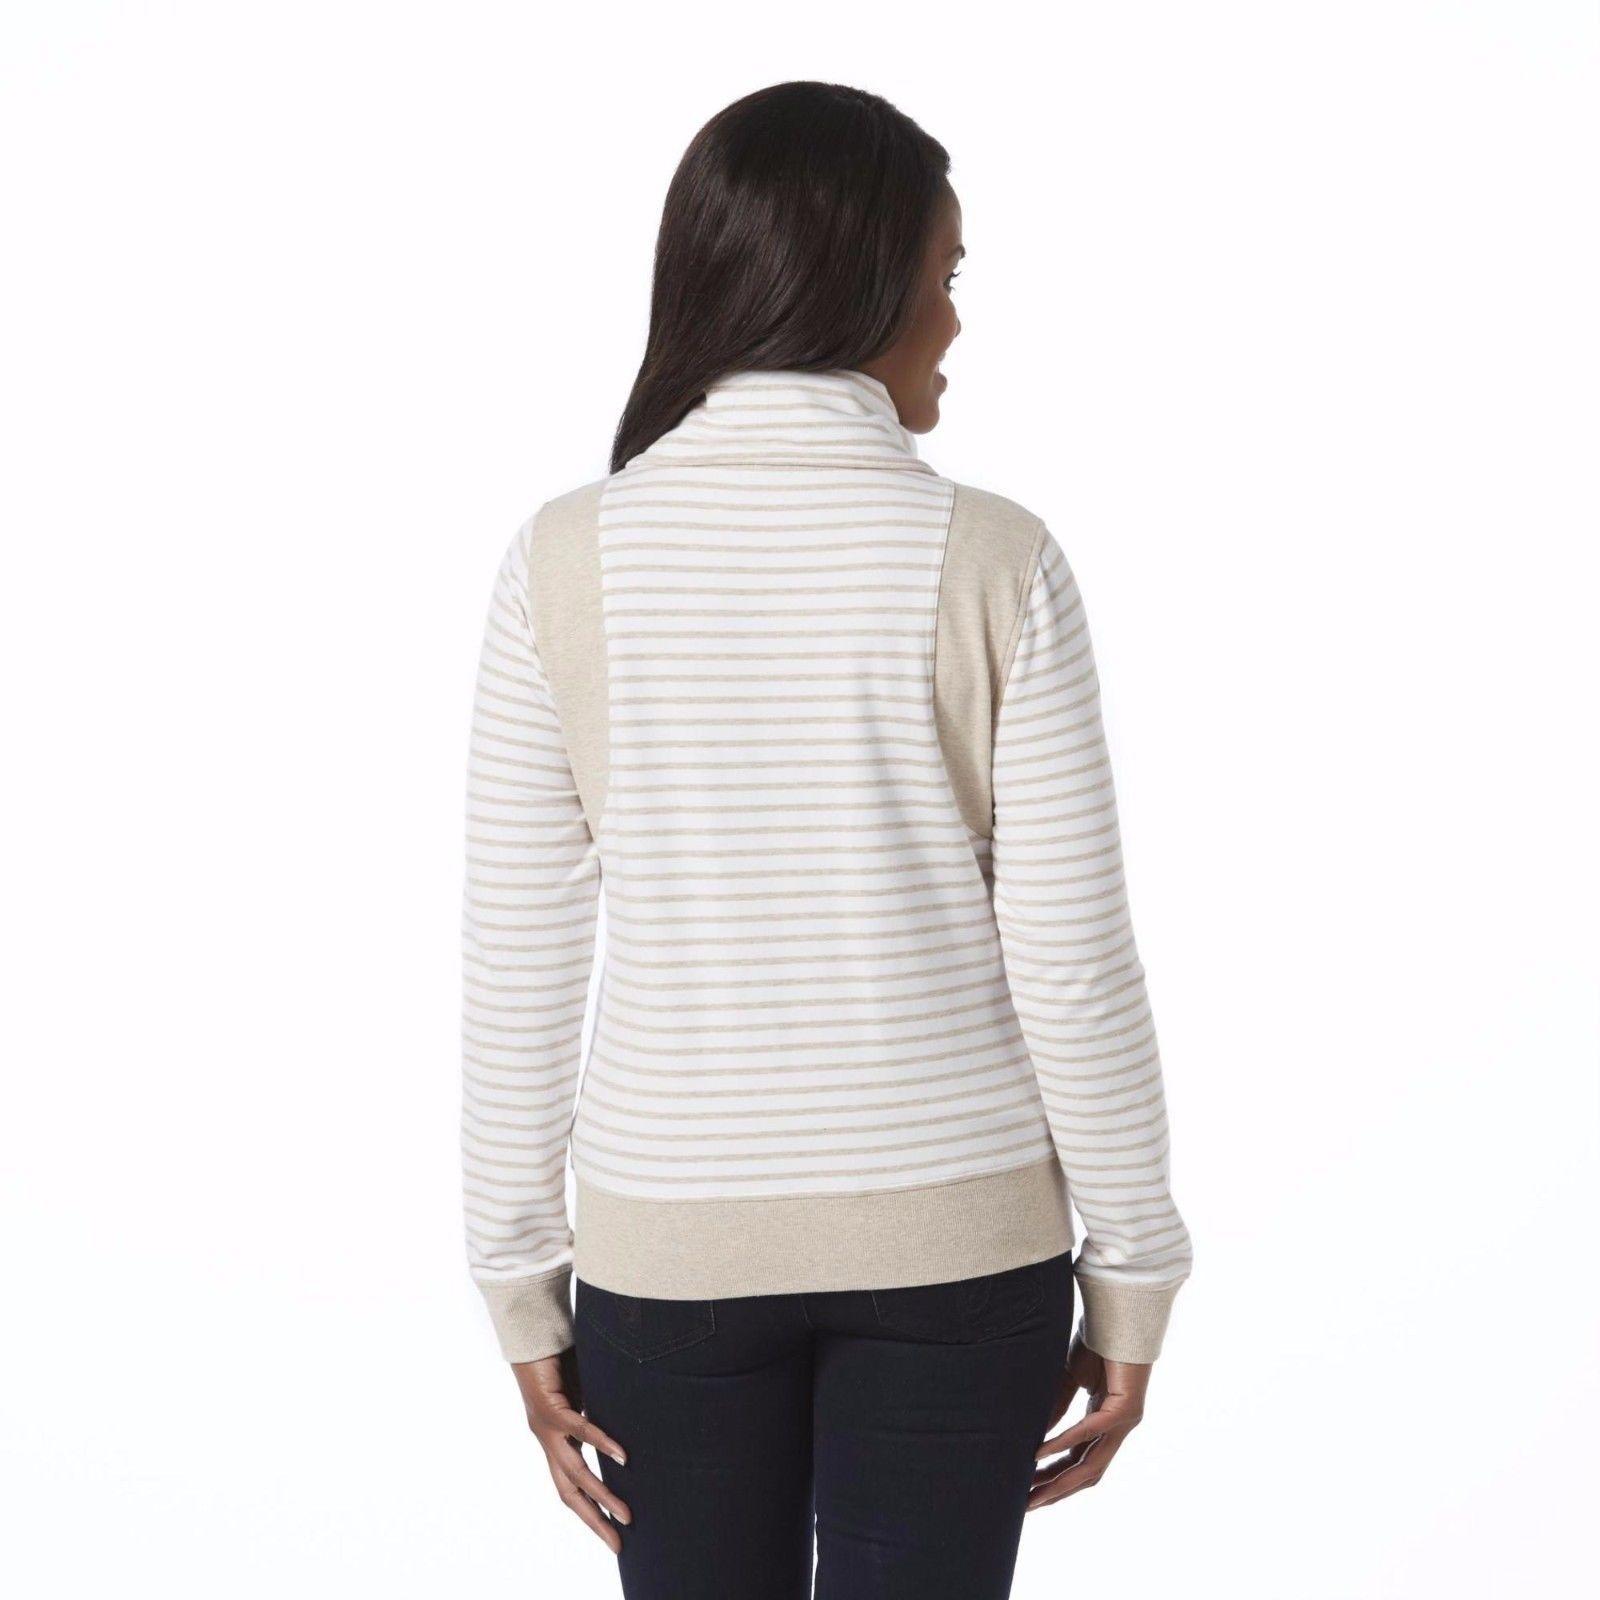 Women's Laura Scott Cowl Neck Striped Zipper Jacket Brown Sugar Size XLarge NEW